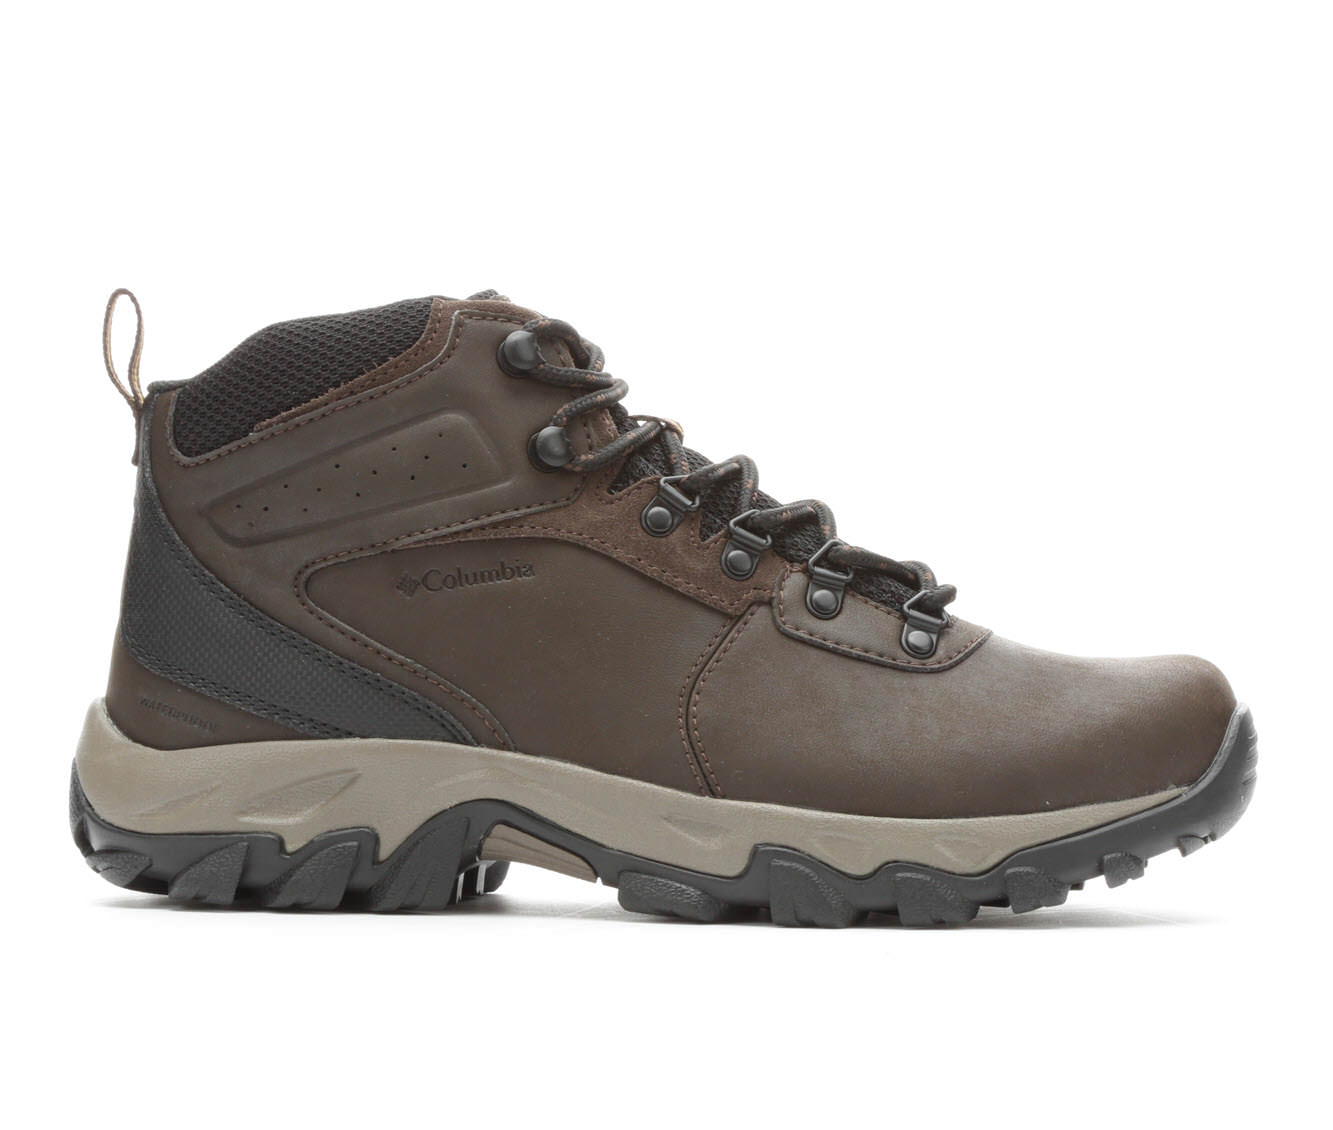 Columbia Newton Ridge Plus II Waterproof Men's Boots (Brown Faux Leather)